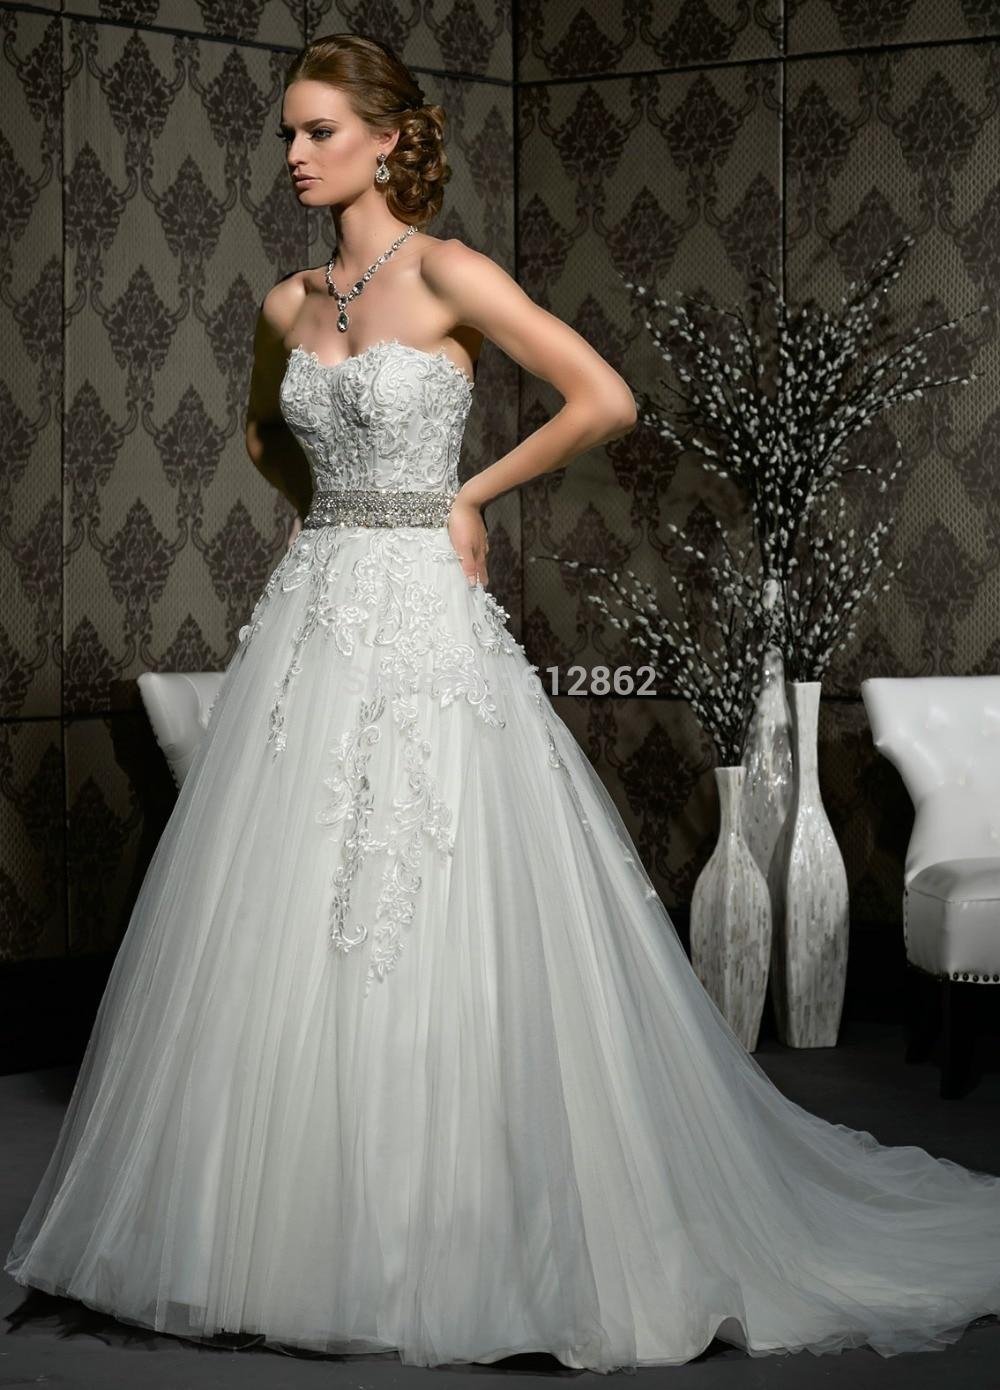 Princess Cut Wedding Dresses | Dress images